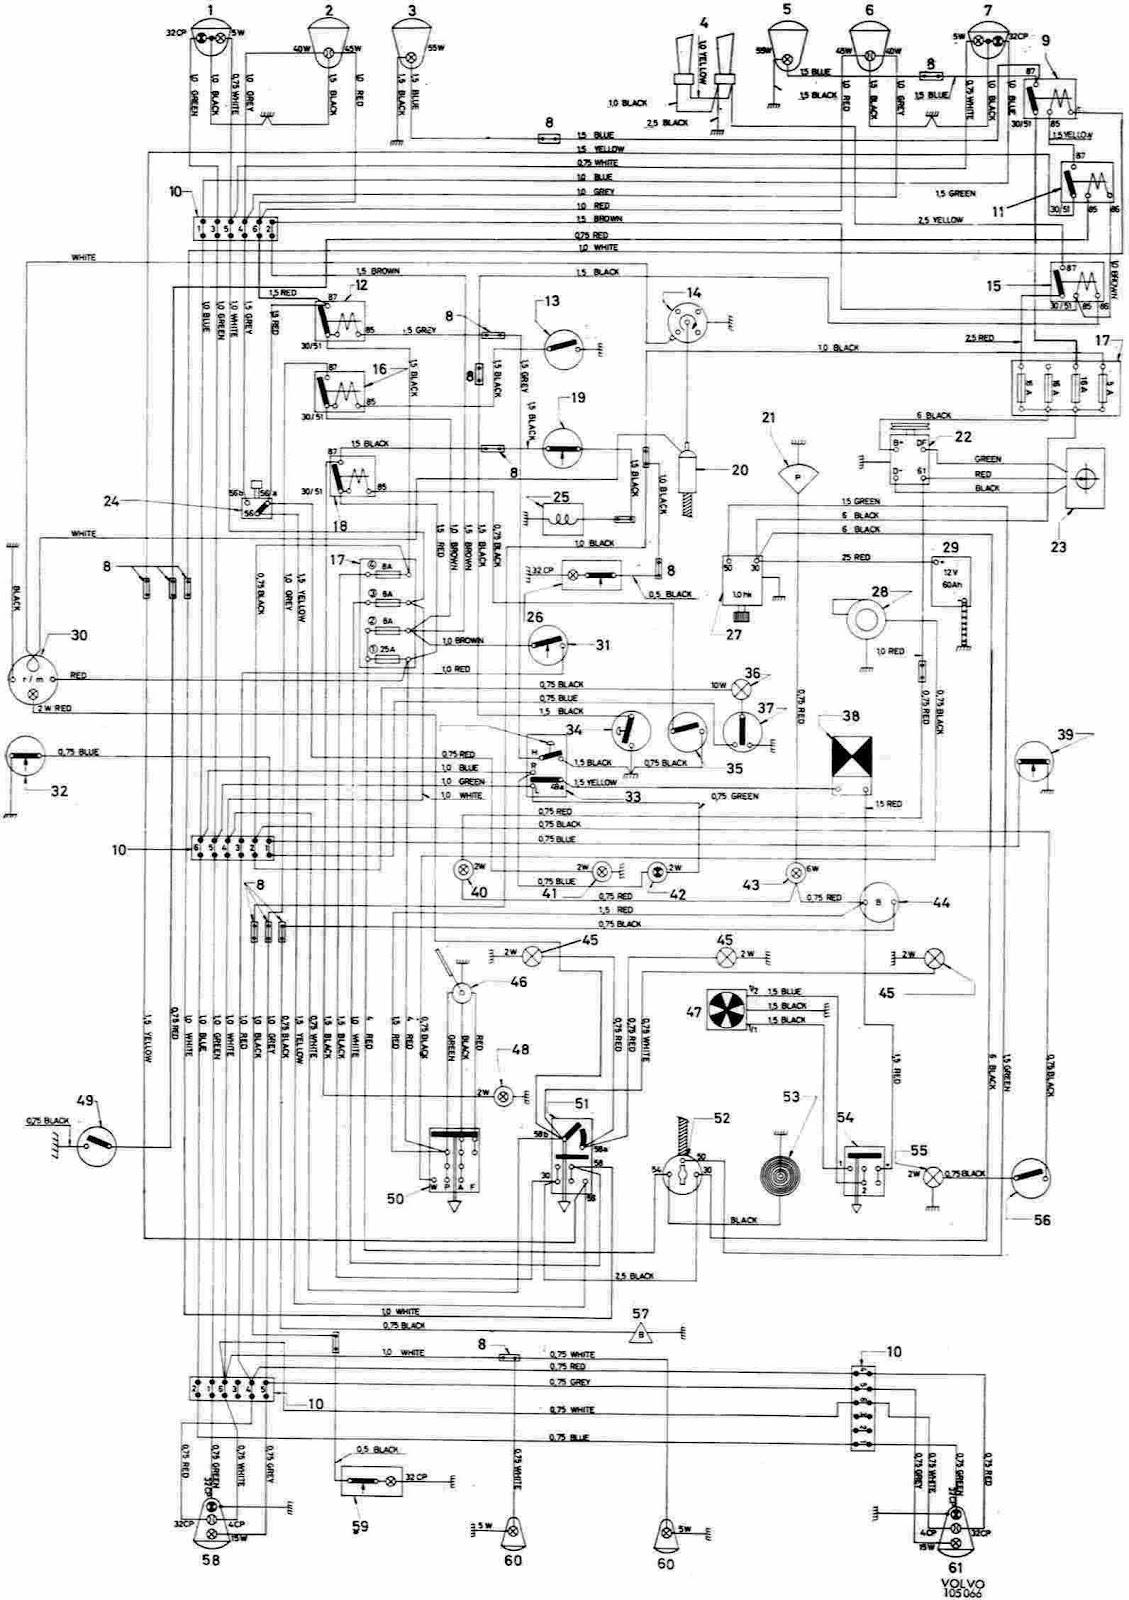 HS_1604] Volvo Truck After Treatment Wiring Schematic Schematic Wiring | Volvo S70 Wiring Diagram Pdf |  | Brece Inrebe Mohammedshrine Librar Wiring 101